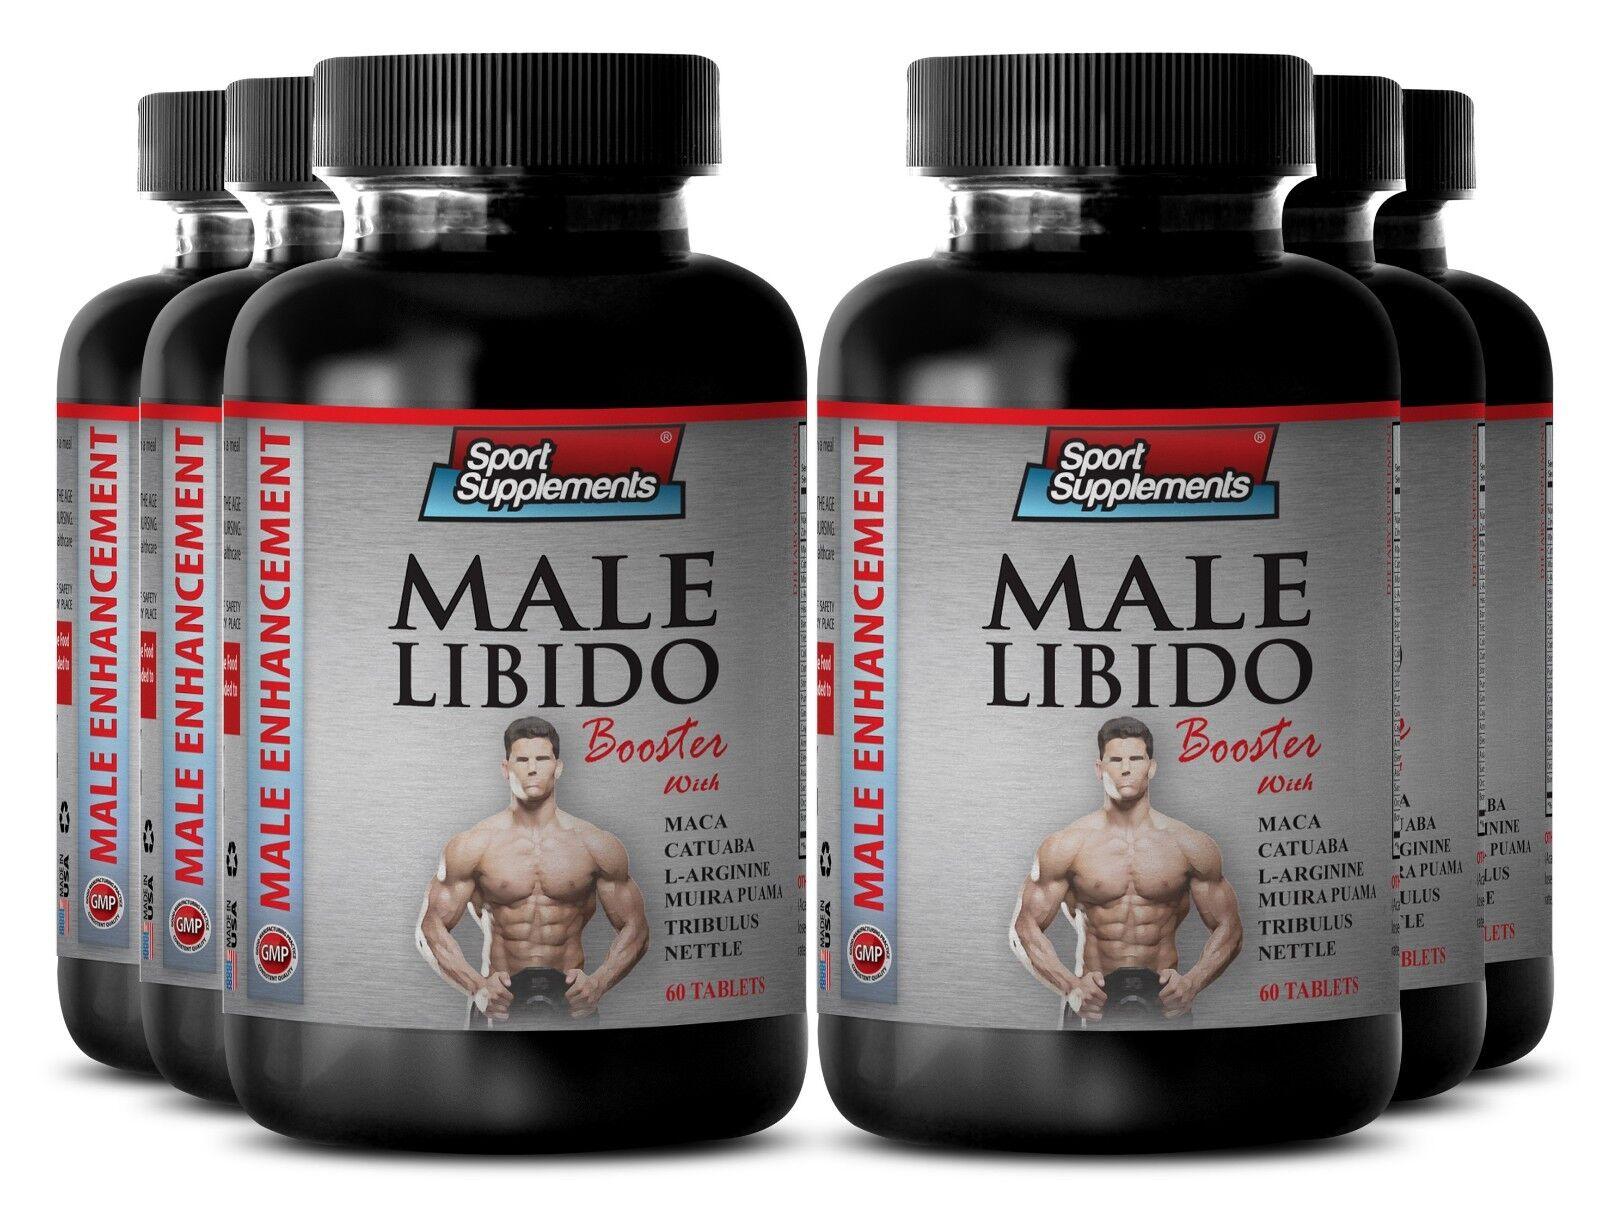 Brazilian Catuaba - Libido Male Libido - Booster 1270mg - Male Extender Pills 6B b33494